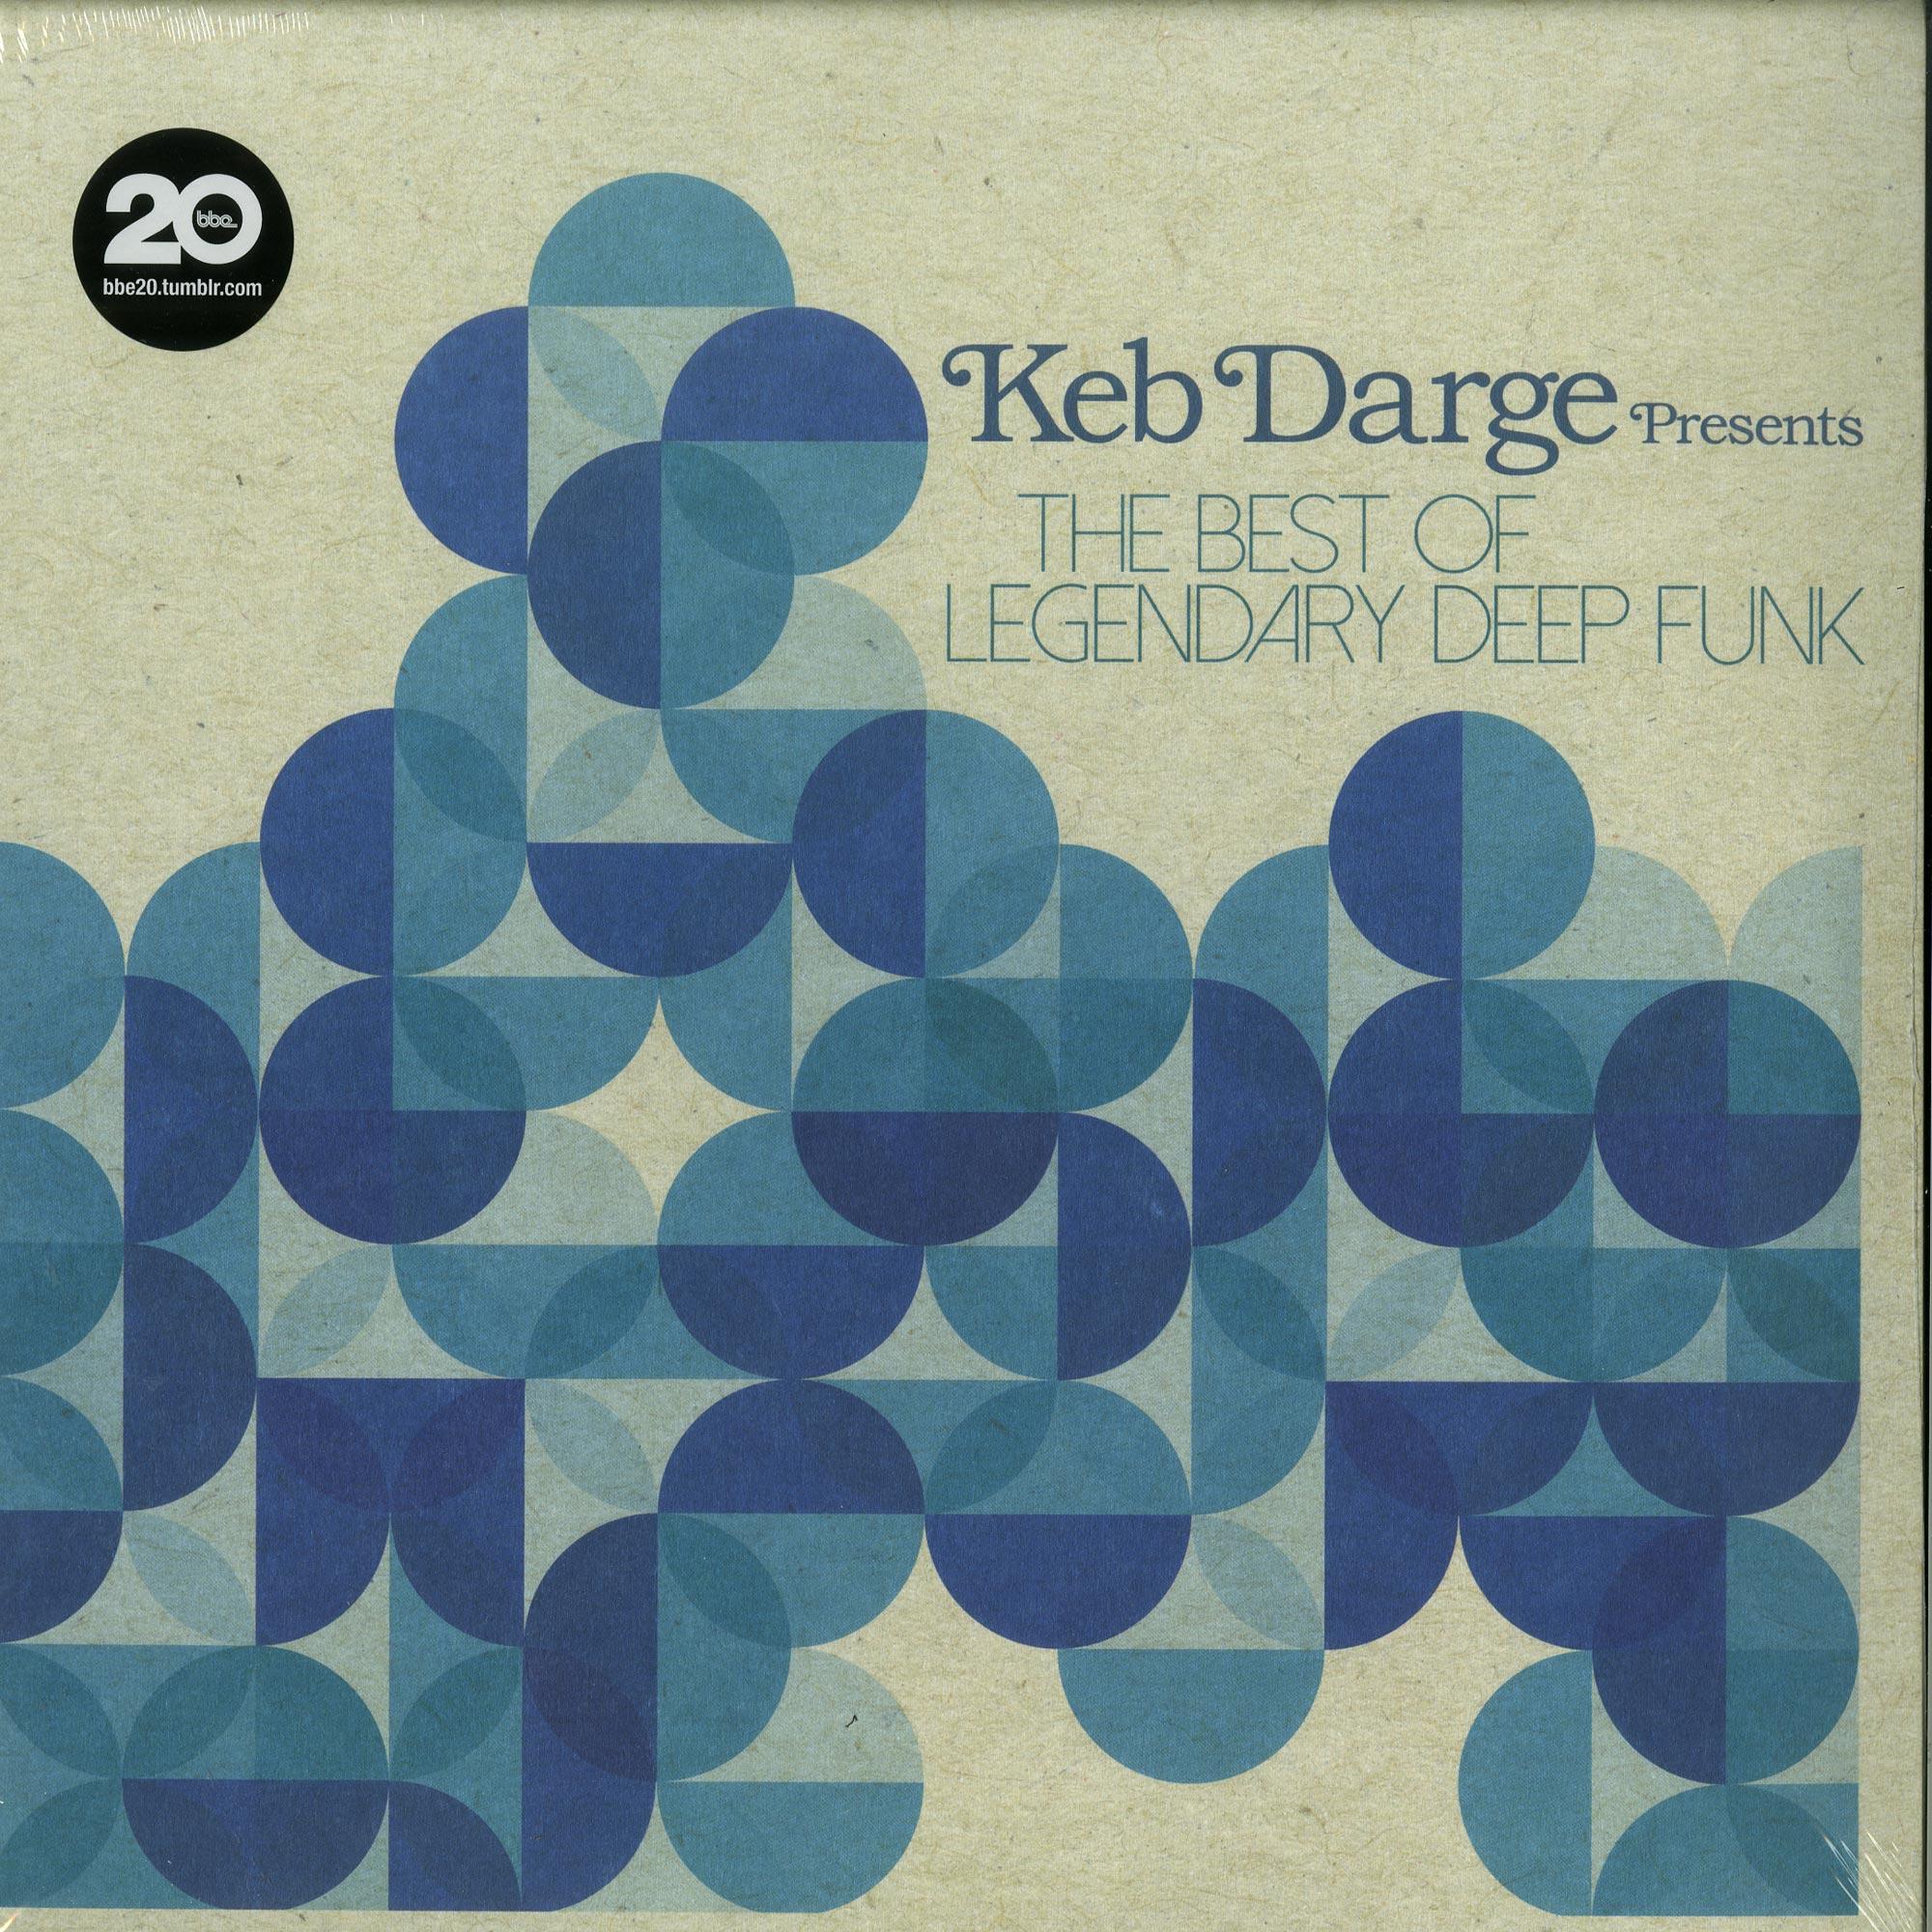 Keb Darge Pres. - THE BEST OF LEGENDARY DEEP FUNK